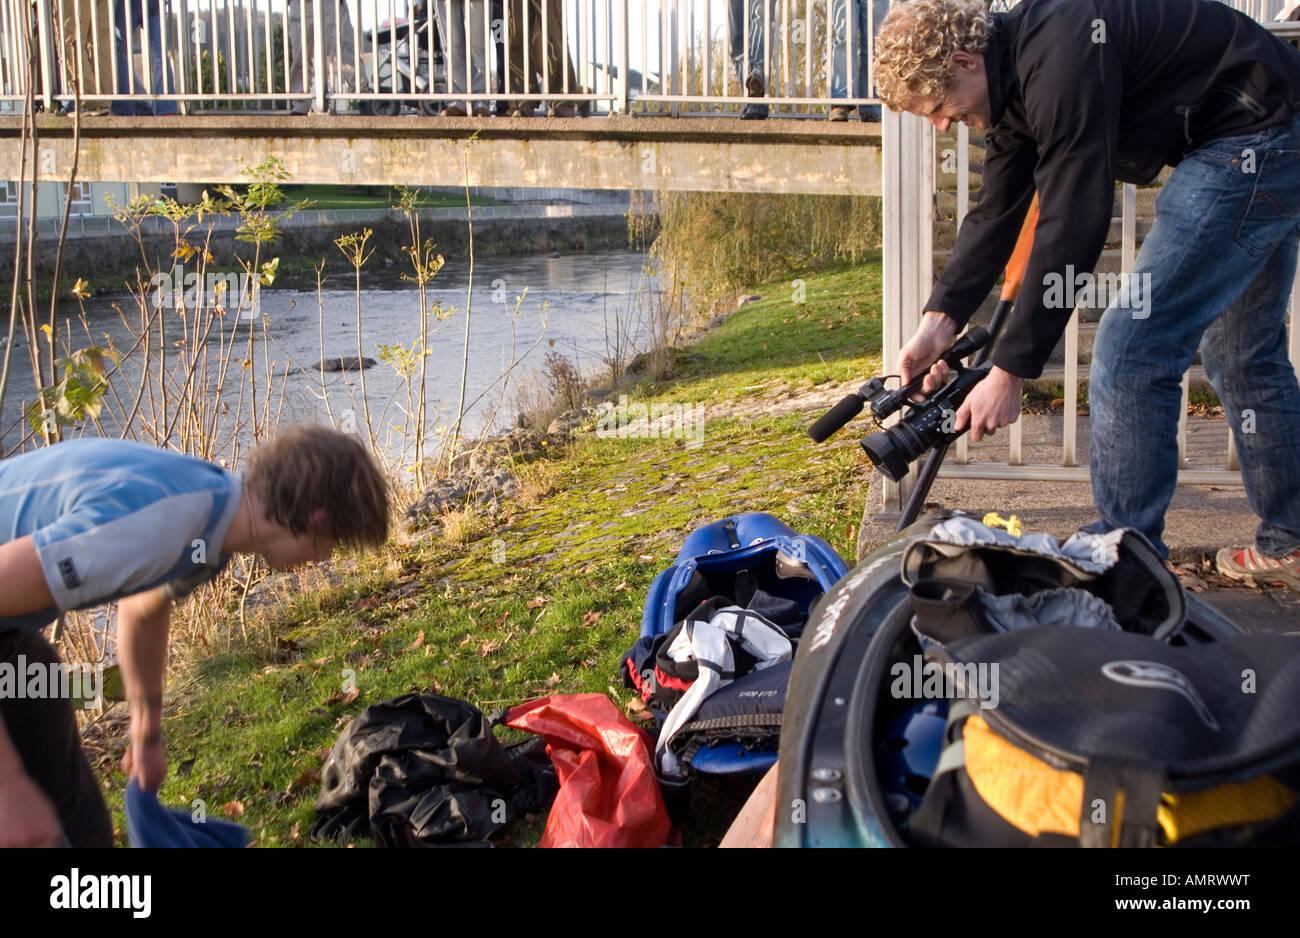 Doug Blane Tim Emmett extreme sports athlete filming at the Kendal Mountain Film Adventure Film Academy Stock Photo